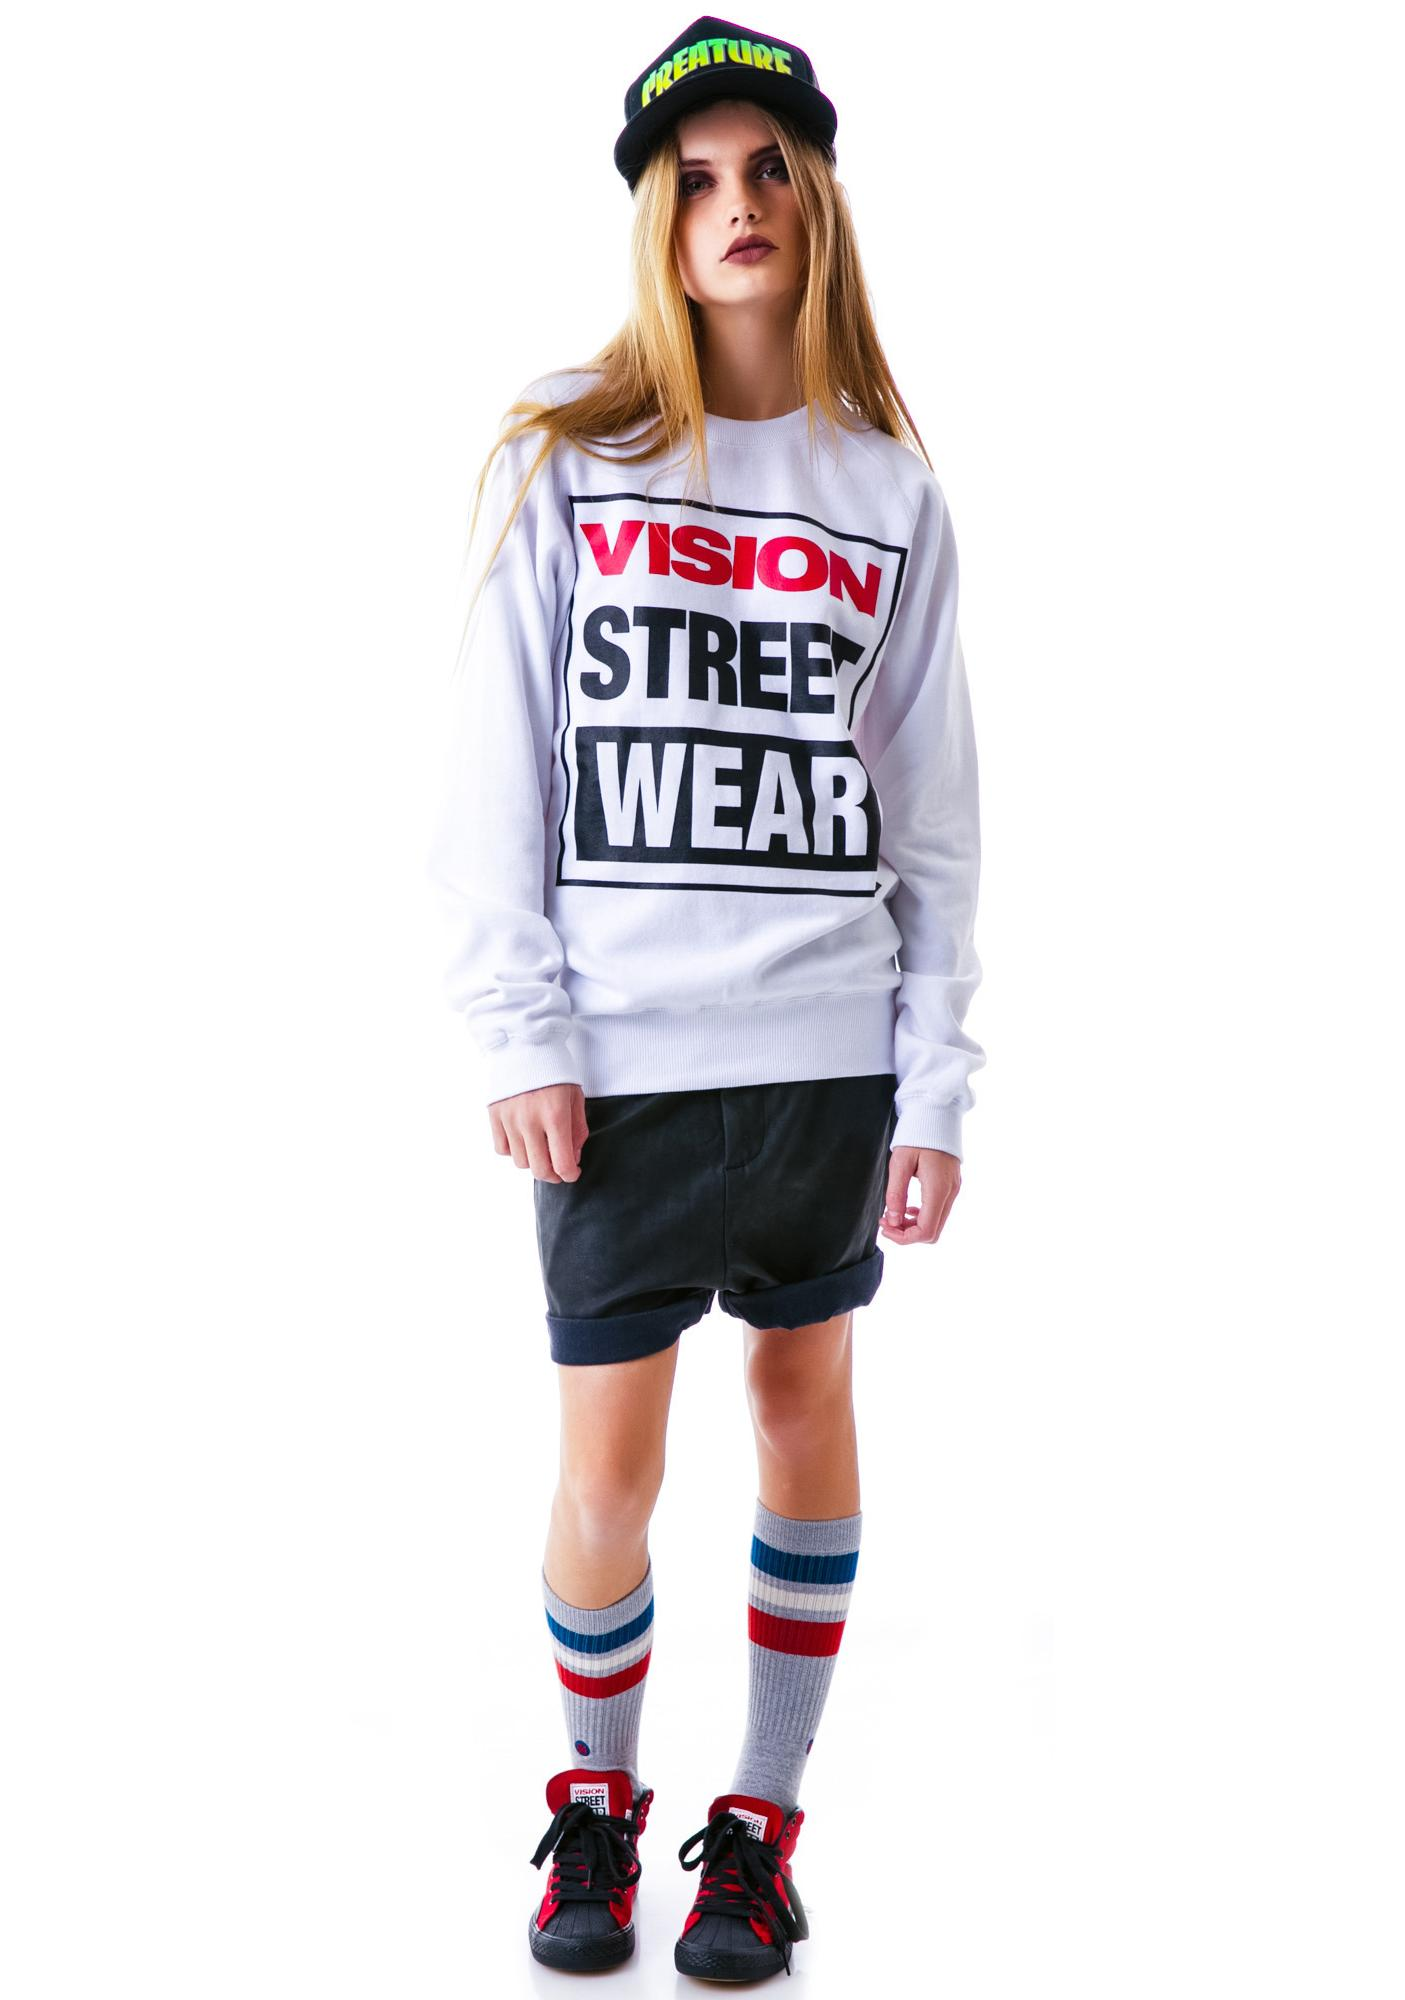 Vision Street Wear Vision Street Wear Logo Sweatshirt